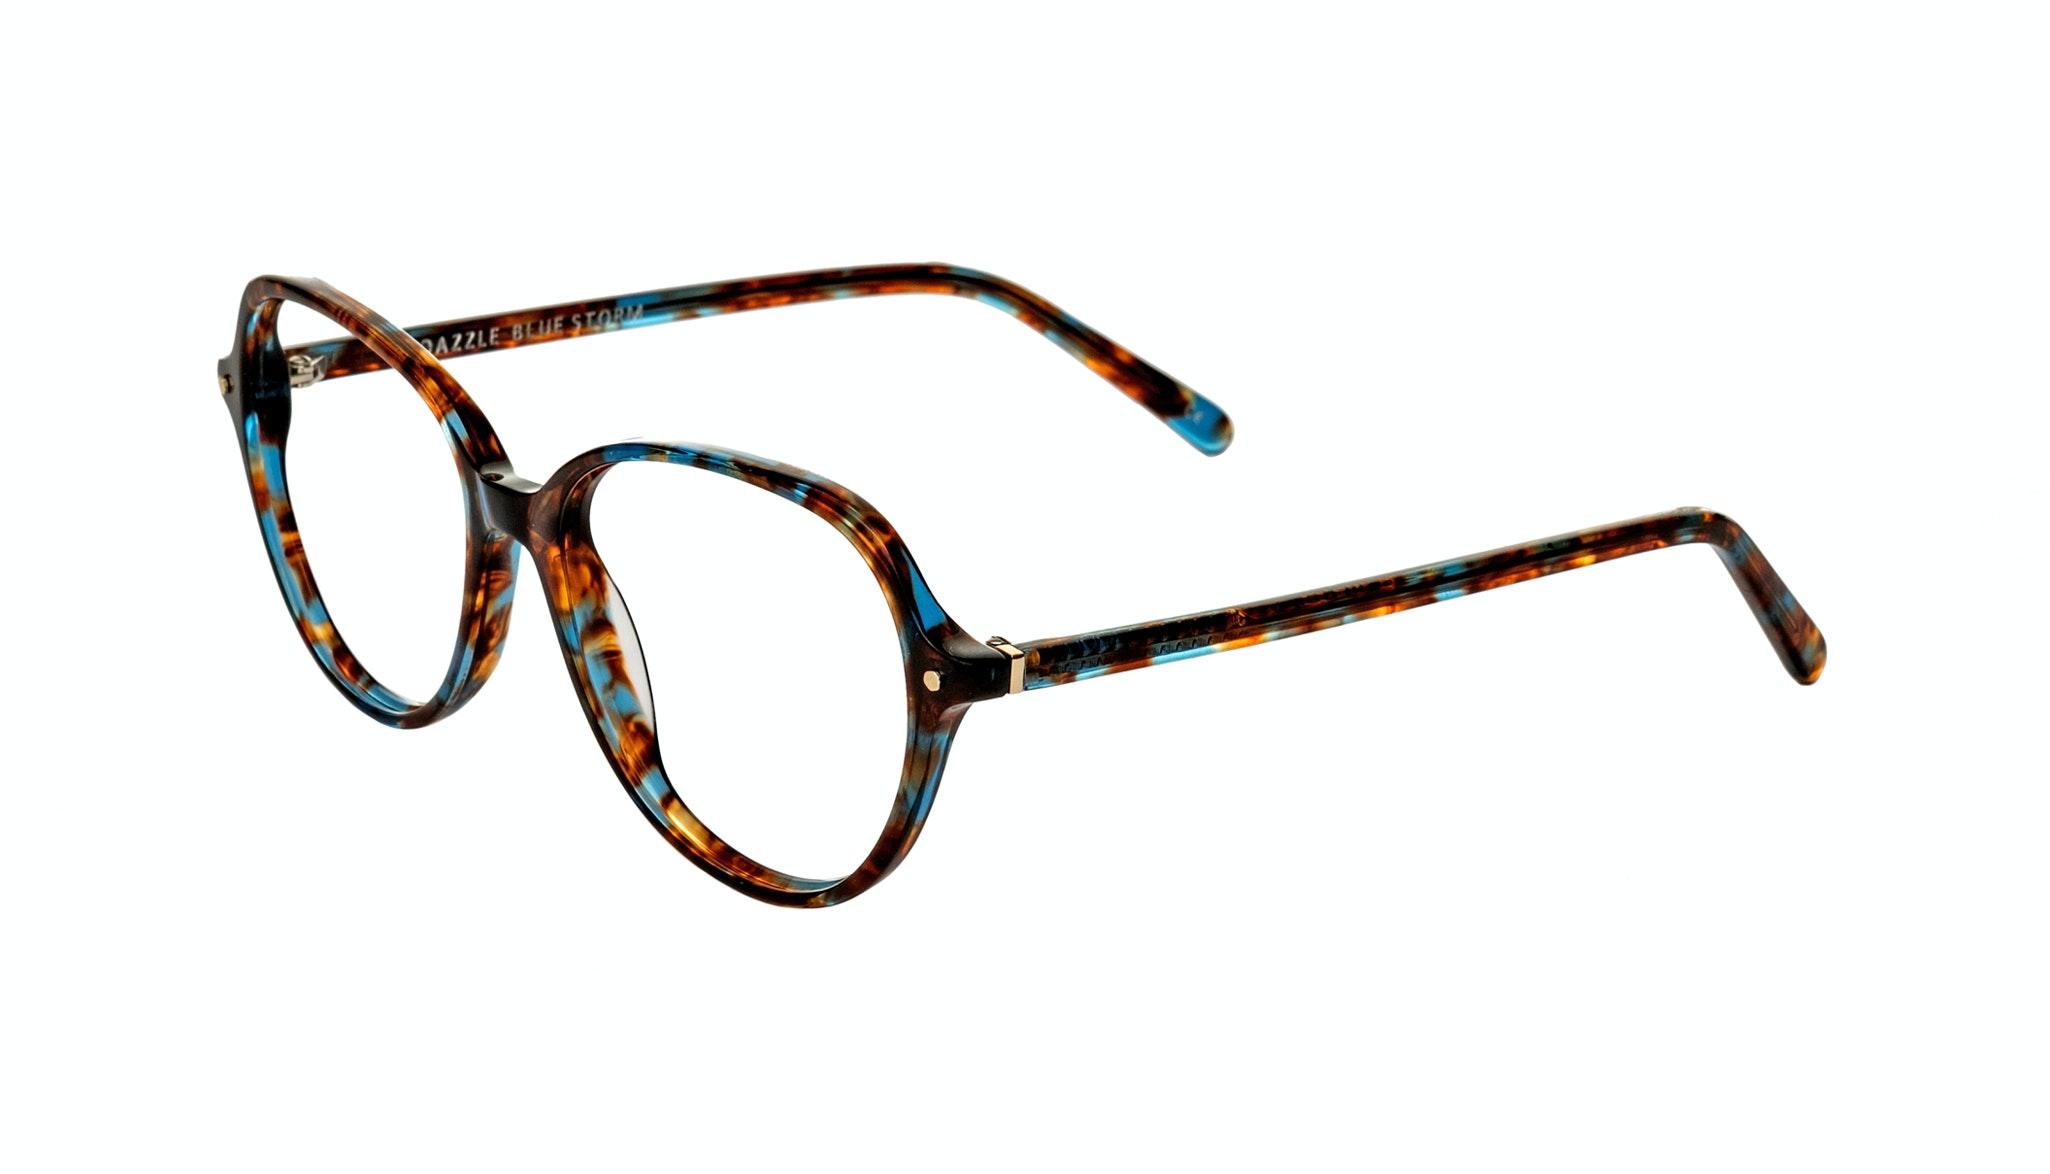 Affordable Fashion Glasses Round Eyeglasses Women Dazzle Blue Storm Tilt